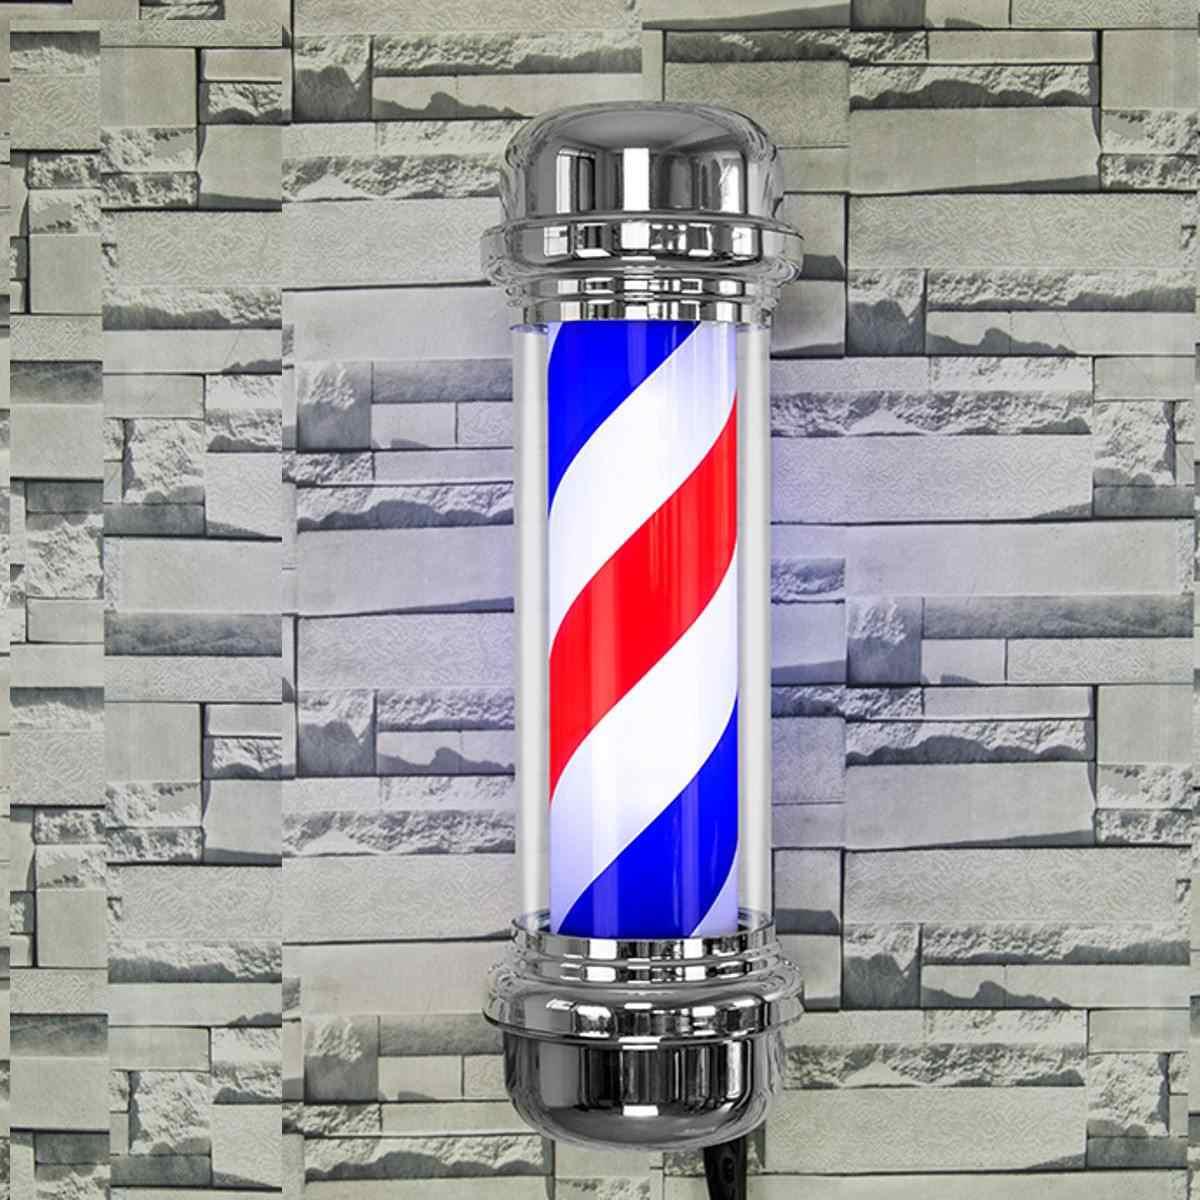 110V/220V LED Barber Shop Sign Pole Light Red White Blue Stripe Design Roating Salon Wall Hanging Light Lamp Beauty Salon Lamp